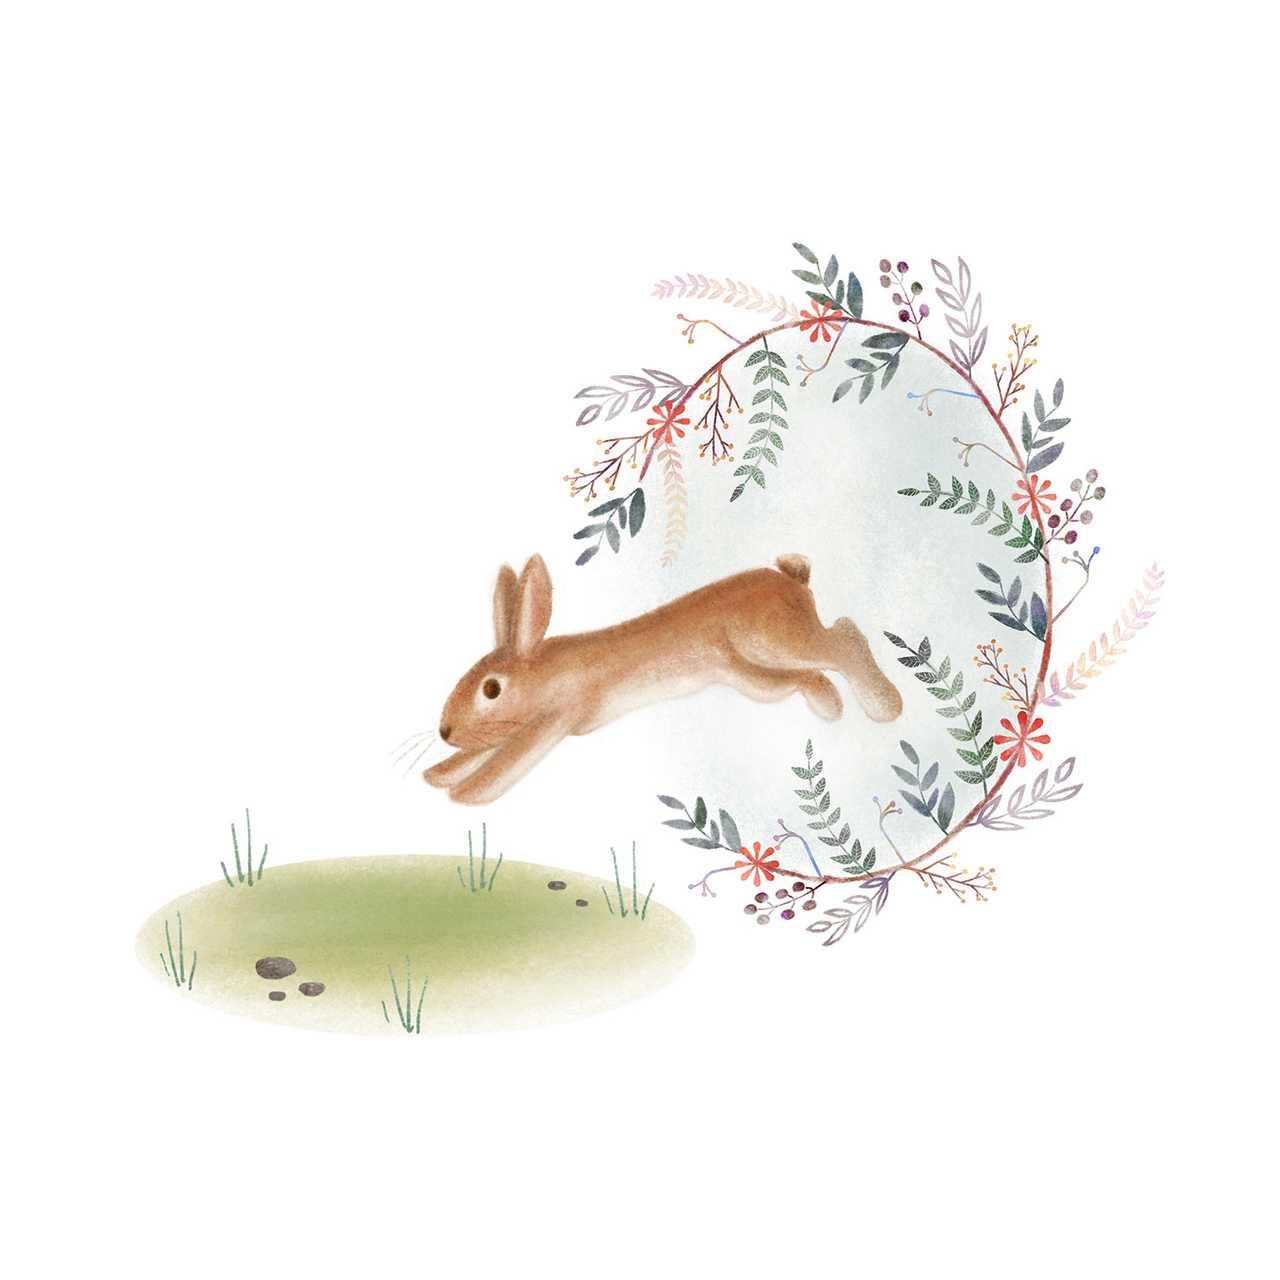 A rabbit jumping through a floral circle